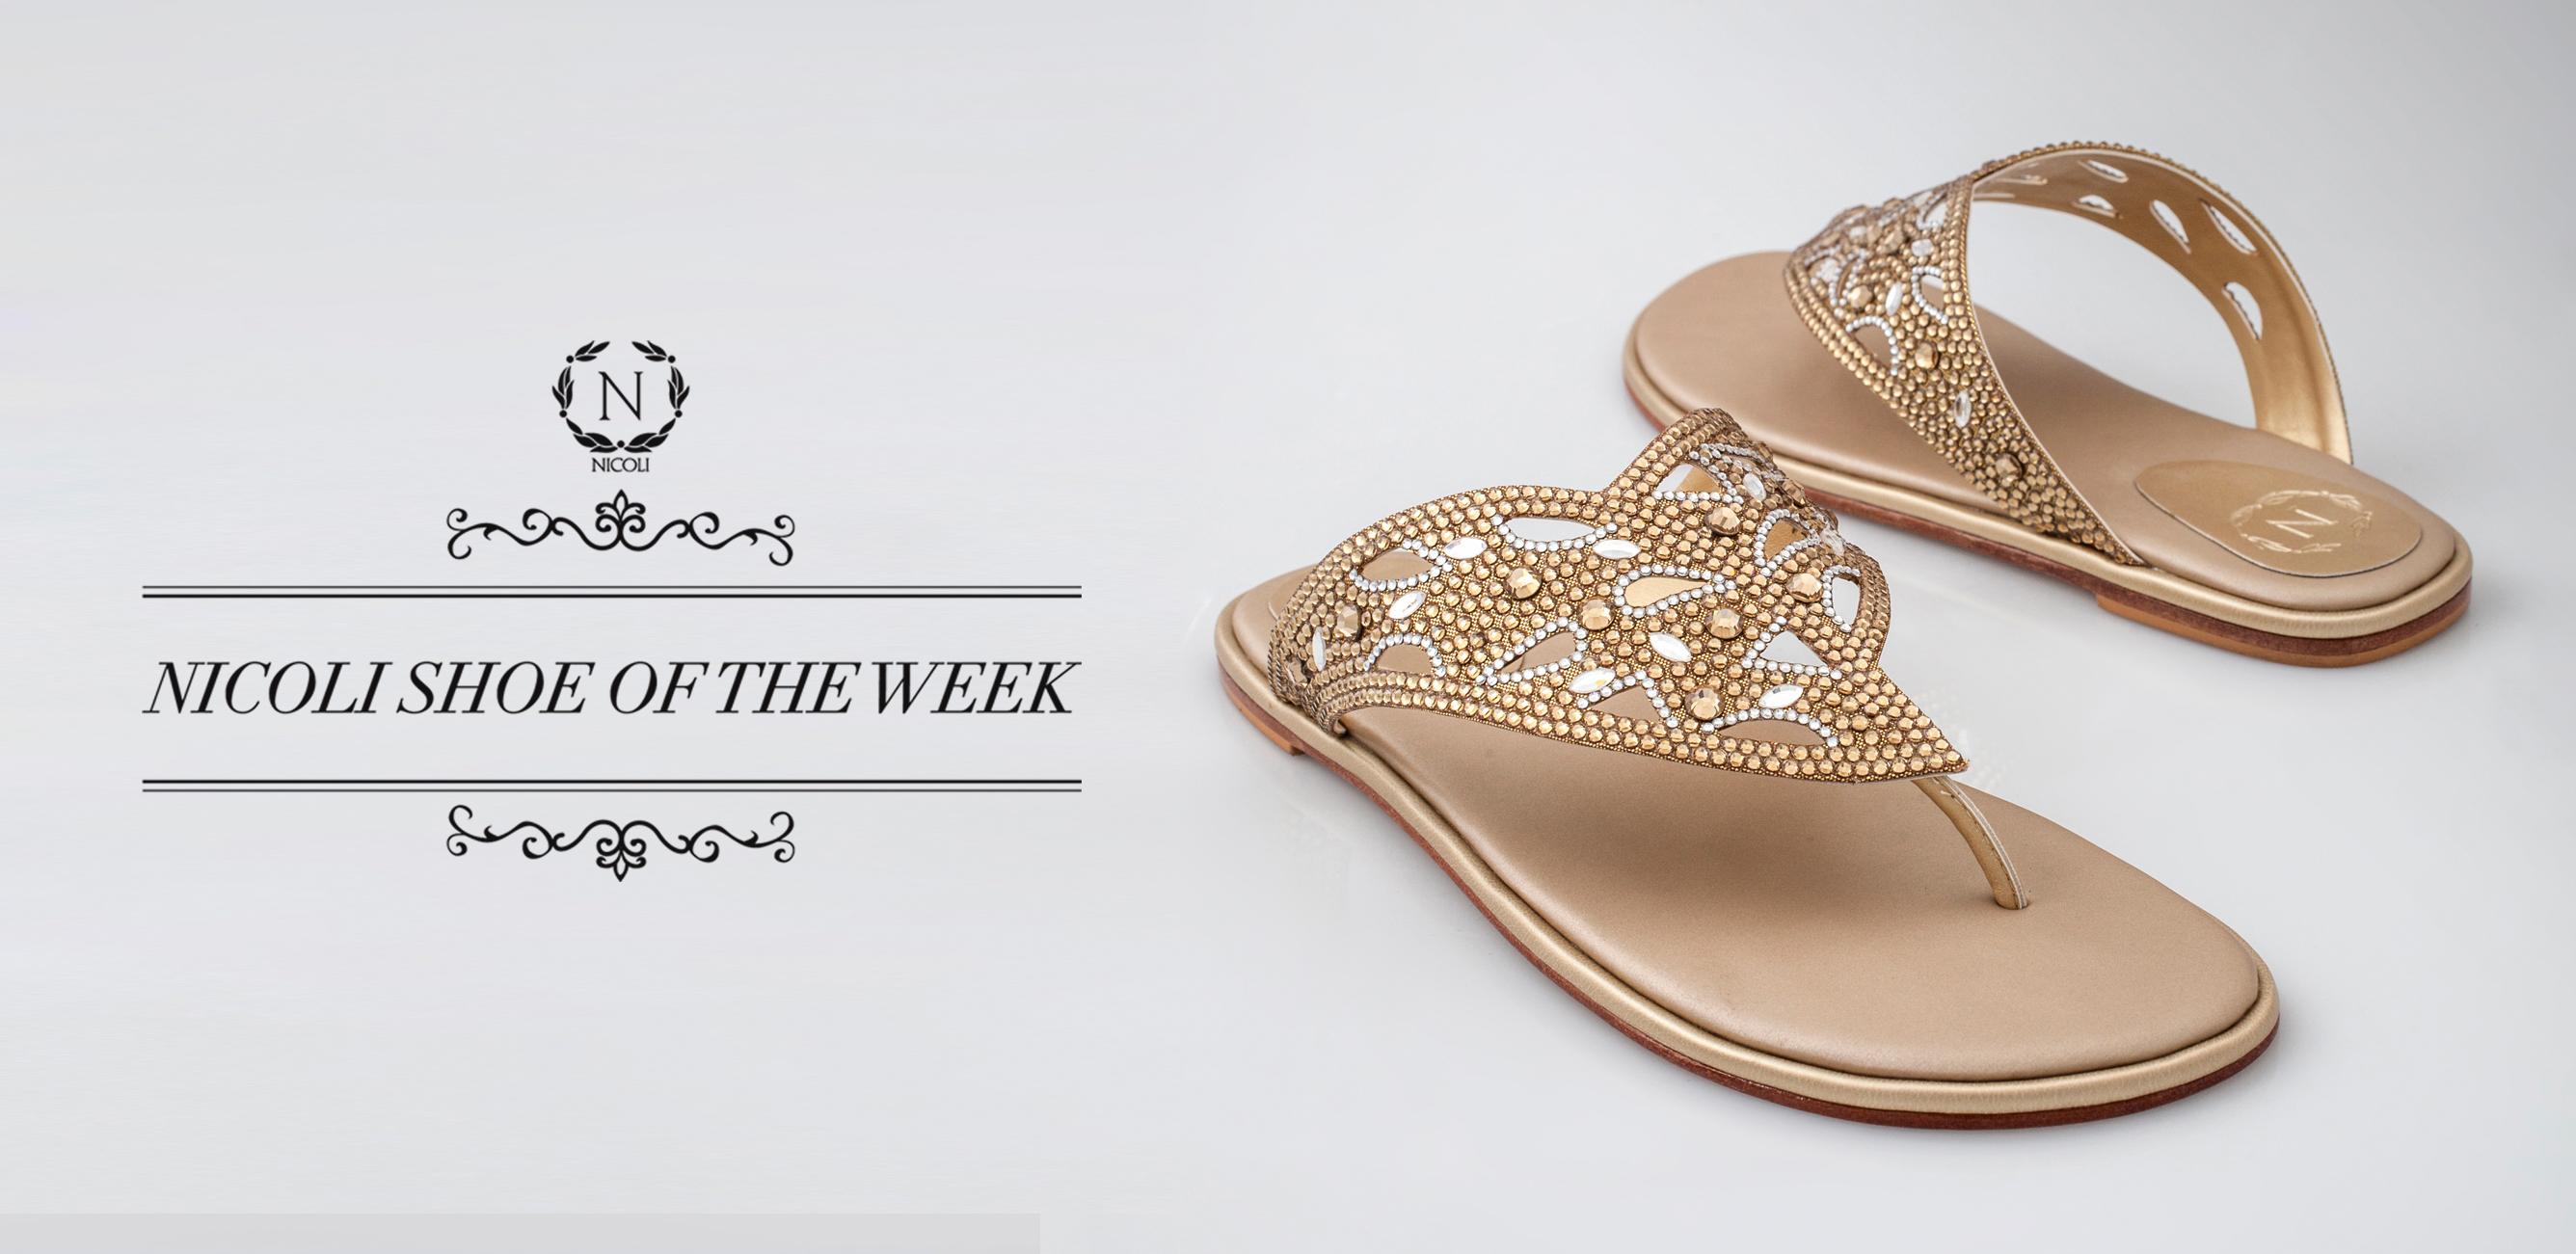 NICOLI Limited Edition Crystal Embellished Shoe ...